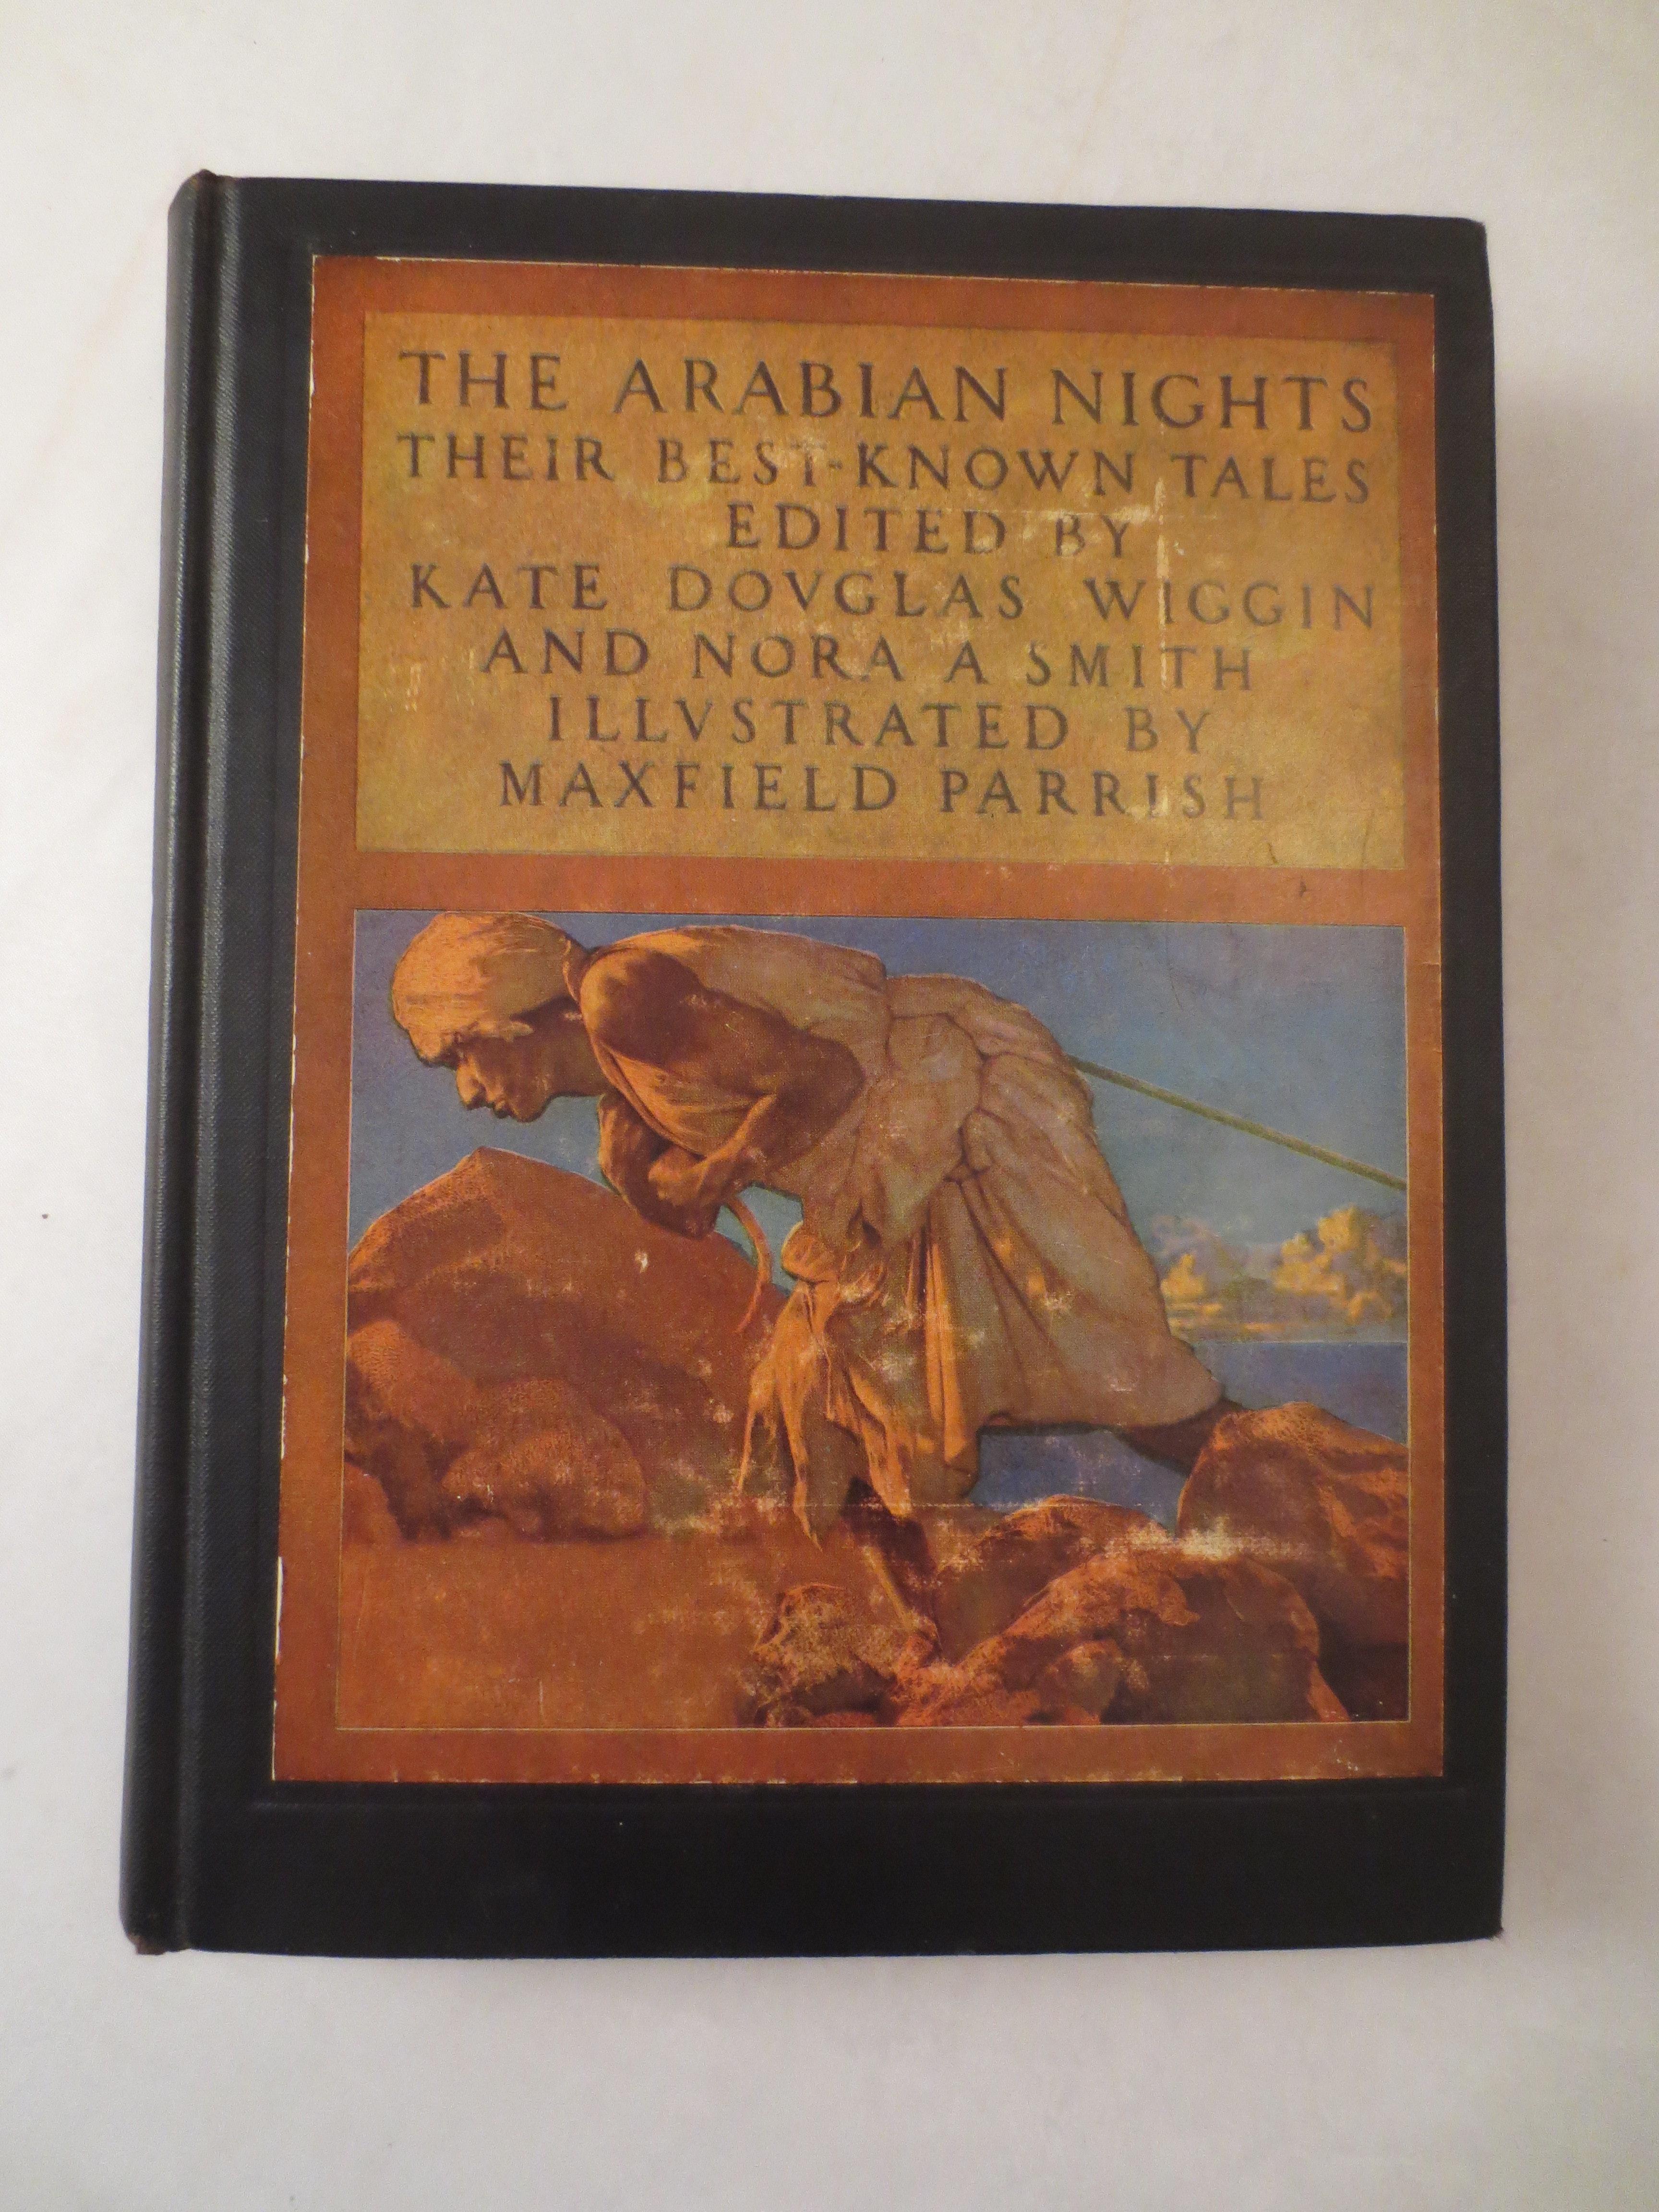 Illiustrated Classics:  The Arabian Nights, Their Best Told Tales, 1933